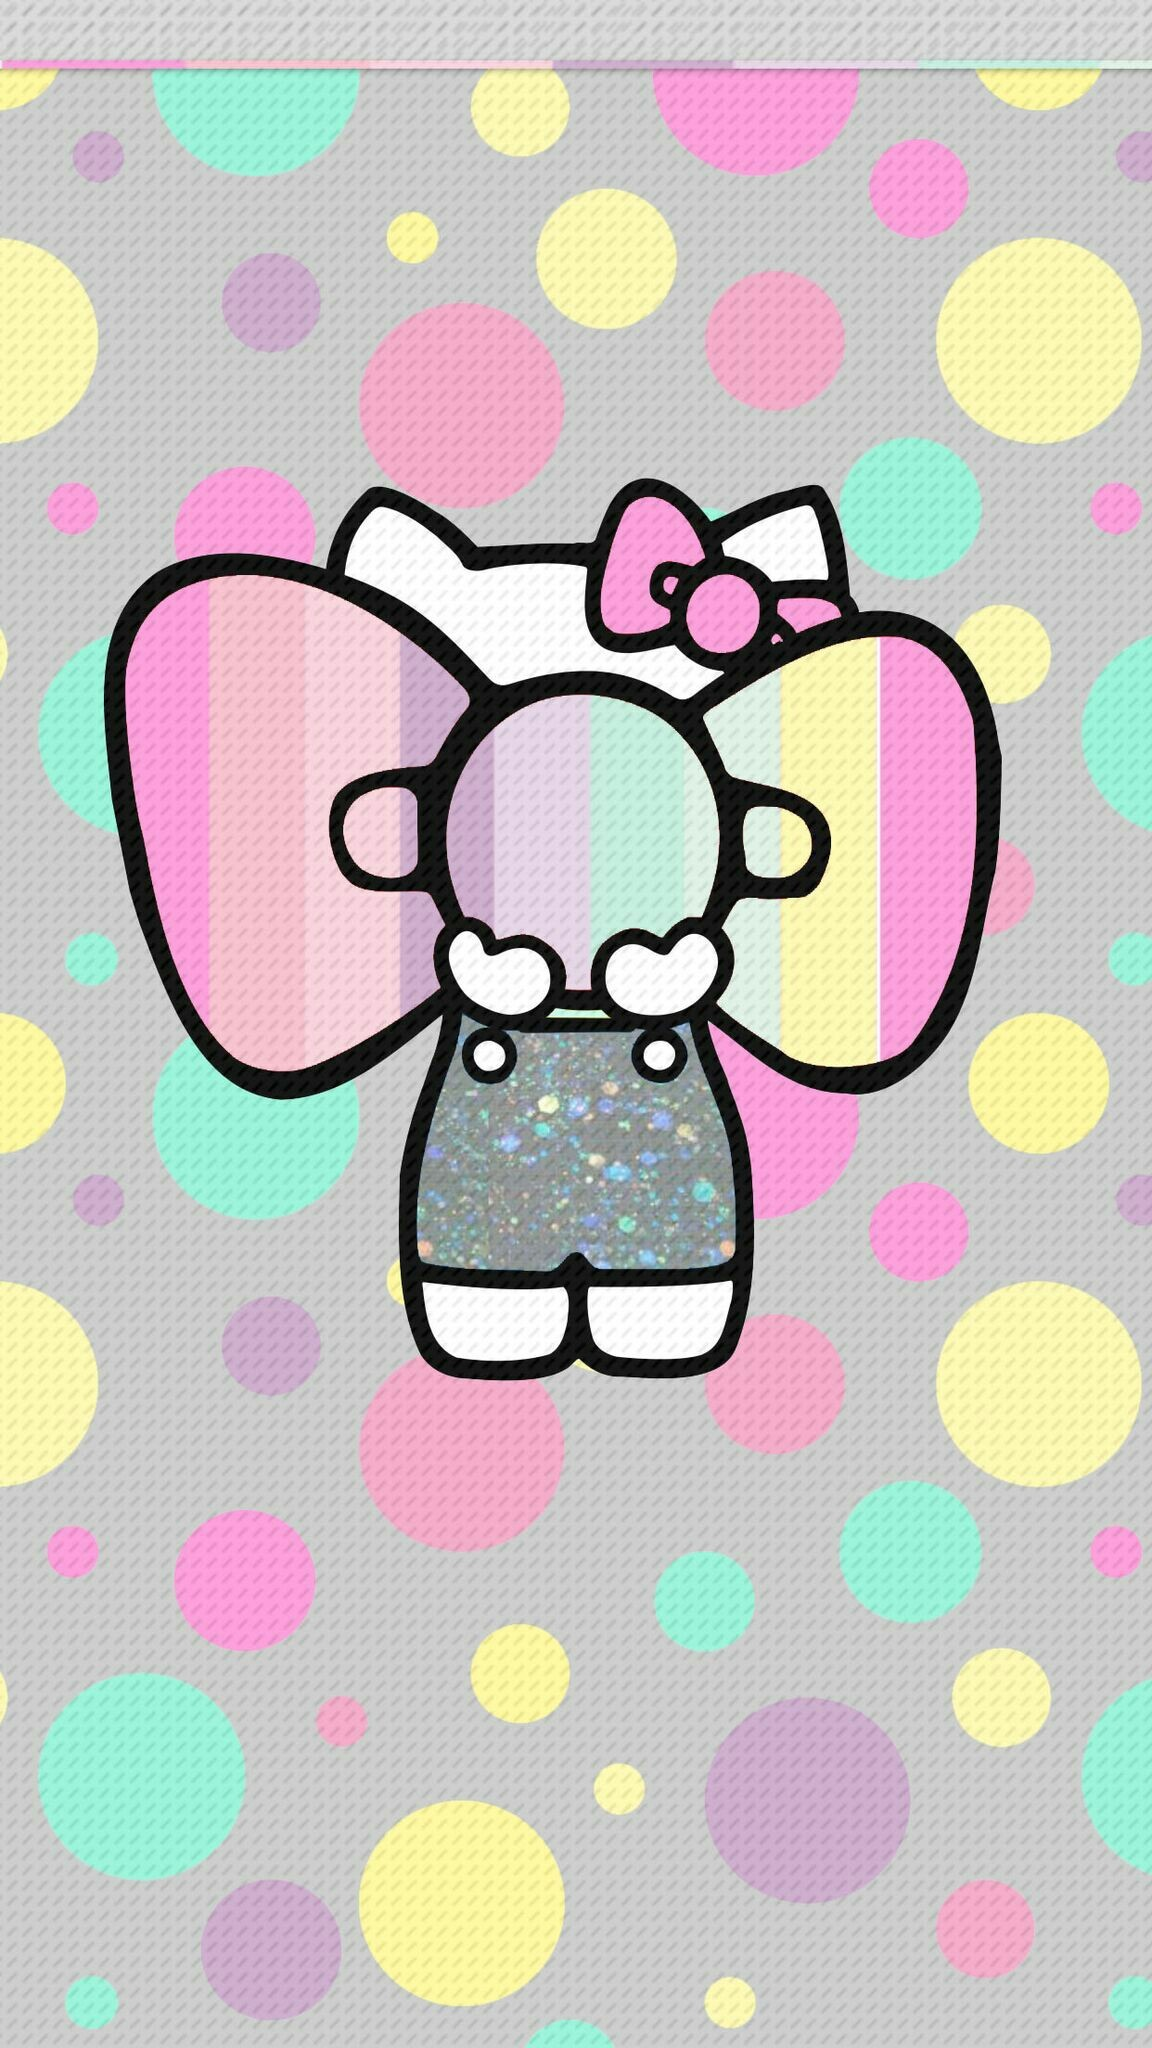 Best Wallpaper Hello Kitty Note 5 - 583779  Image_644964.jpg